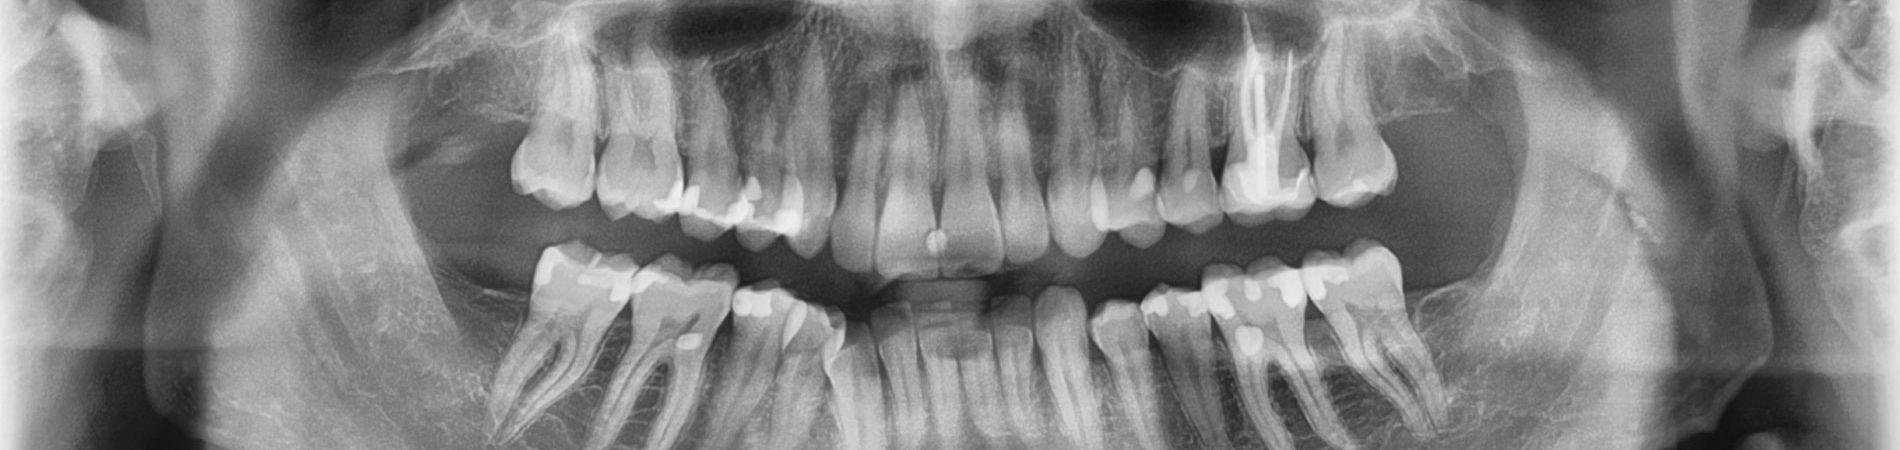 panoramic x-ray radiograph